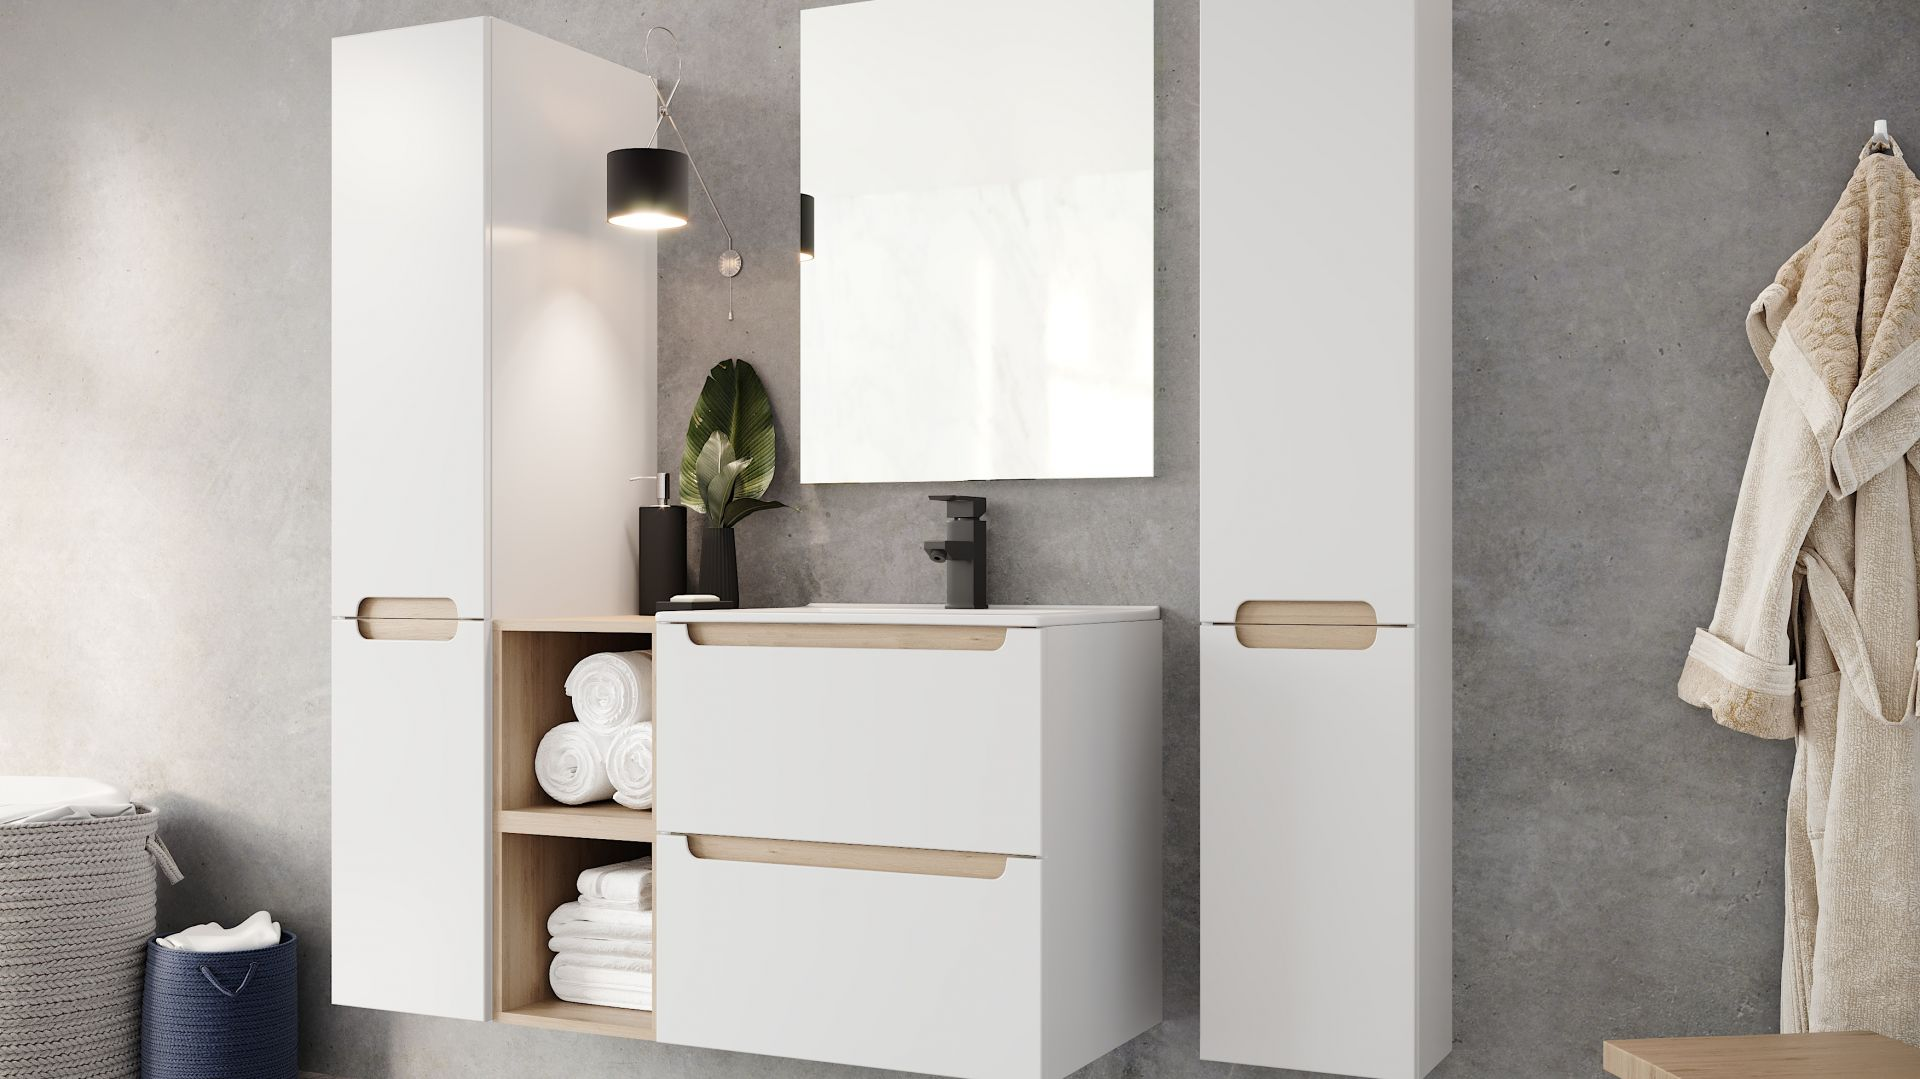 Szafka pod umywalkę z kolekcji mebli Stilla marki Ø NAS. Fot. Deftrans